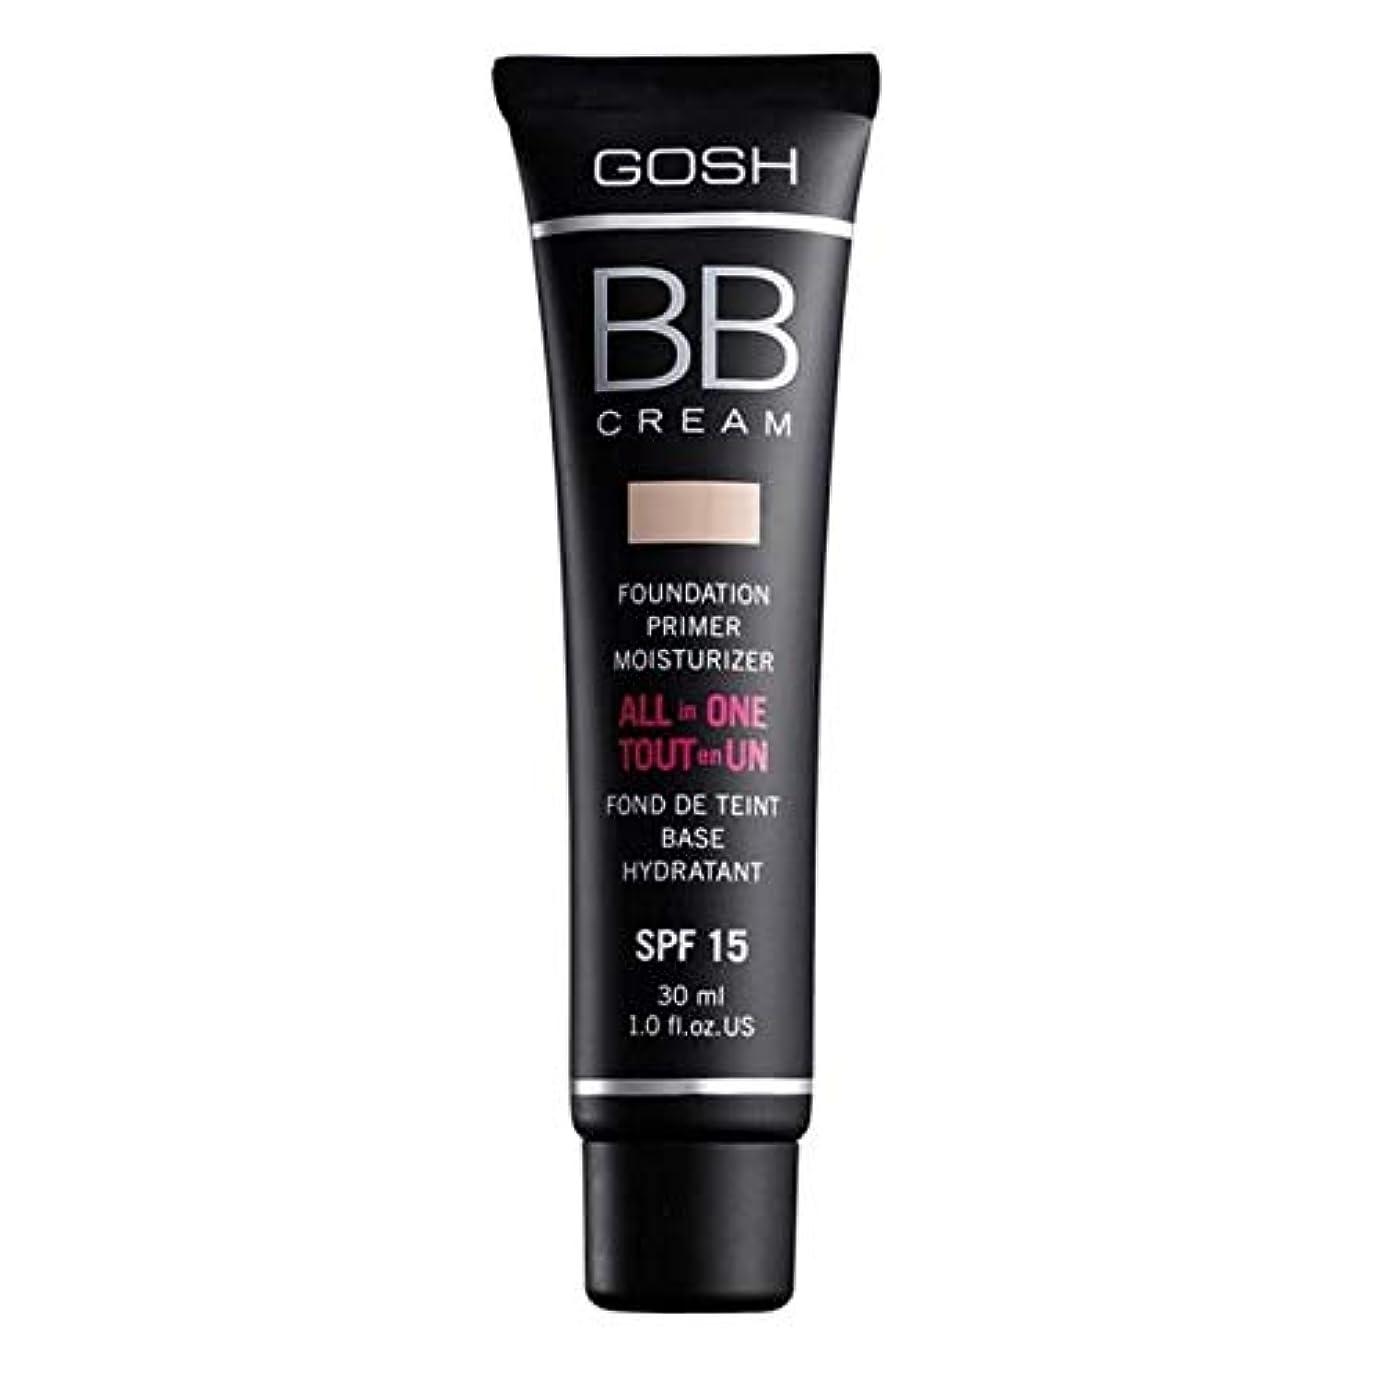 [GOSH ] おやっBbクリームベージュ2 - Gosh BB Cream Beige 2 [並行輸入品]